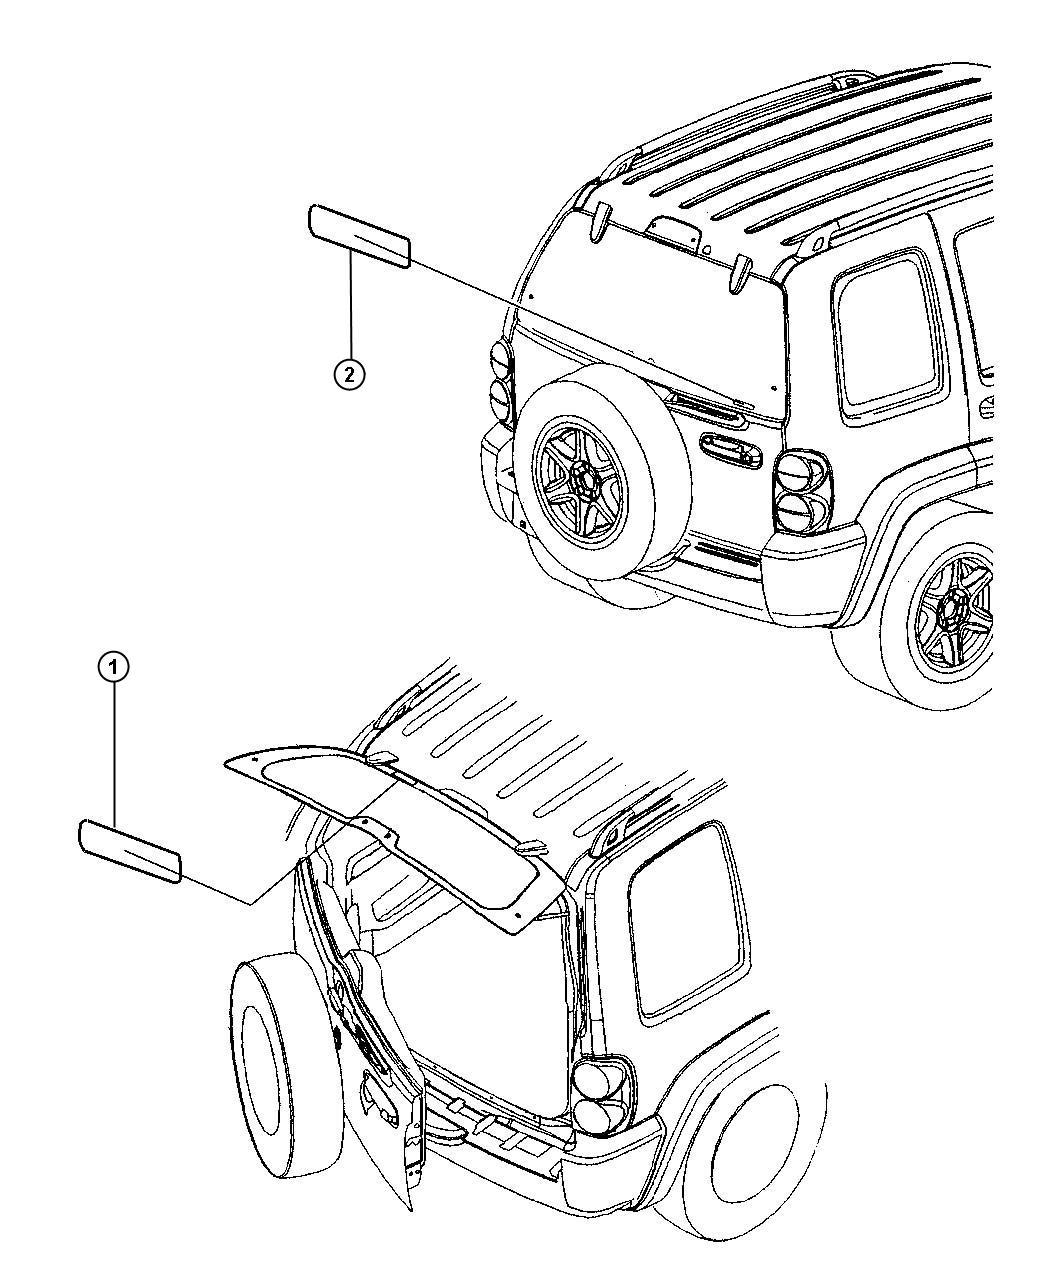 Jeep Liberty Label Brake Fluid Warning Master